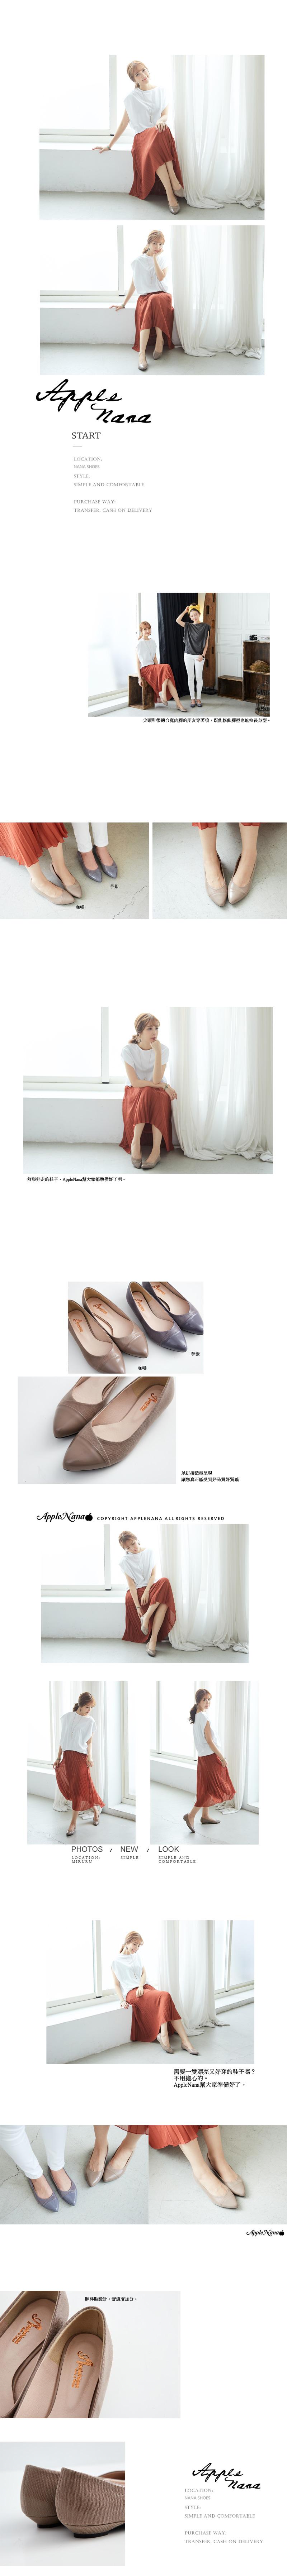 http://shop.r10s.com/5e7ca0c0-ec8c-11e4-ac44-005056b756e3/2016-09/10183-4.jpg